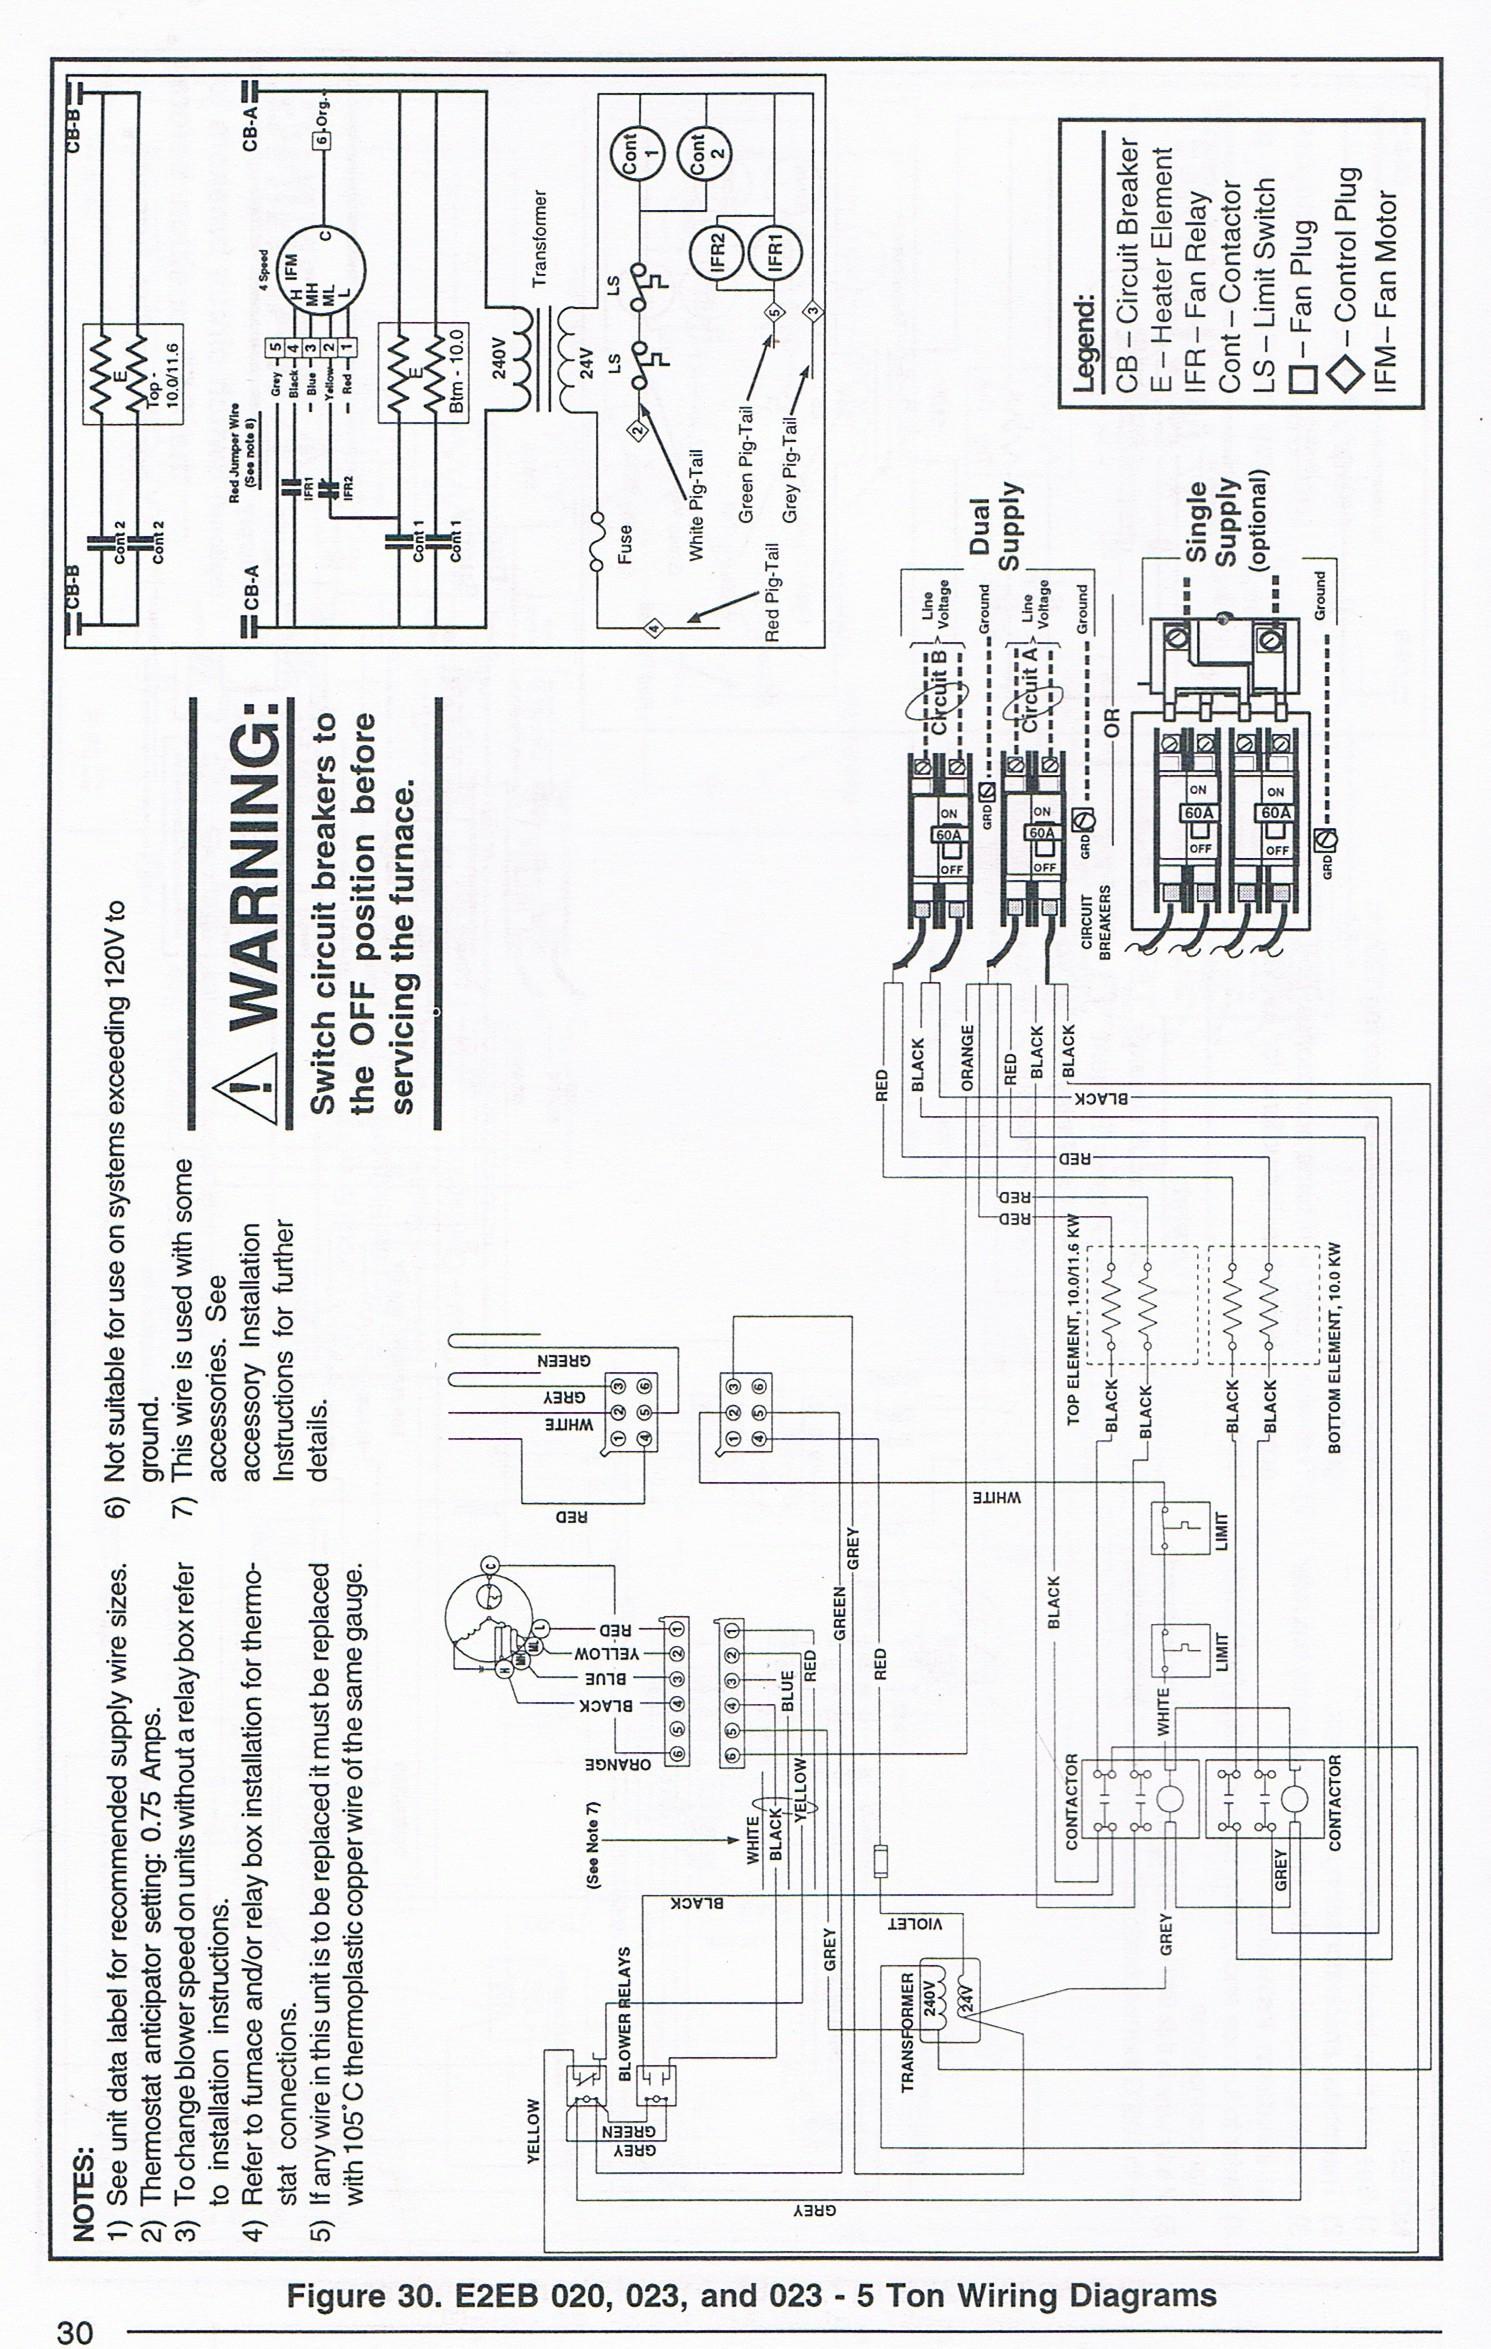 Intertherm Electric Furnace Wiring Diagram Inspirational Nordyne - Intertherm Electric Furnace Wiring Diagram